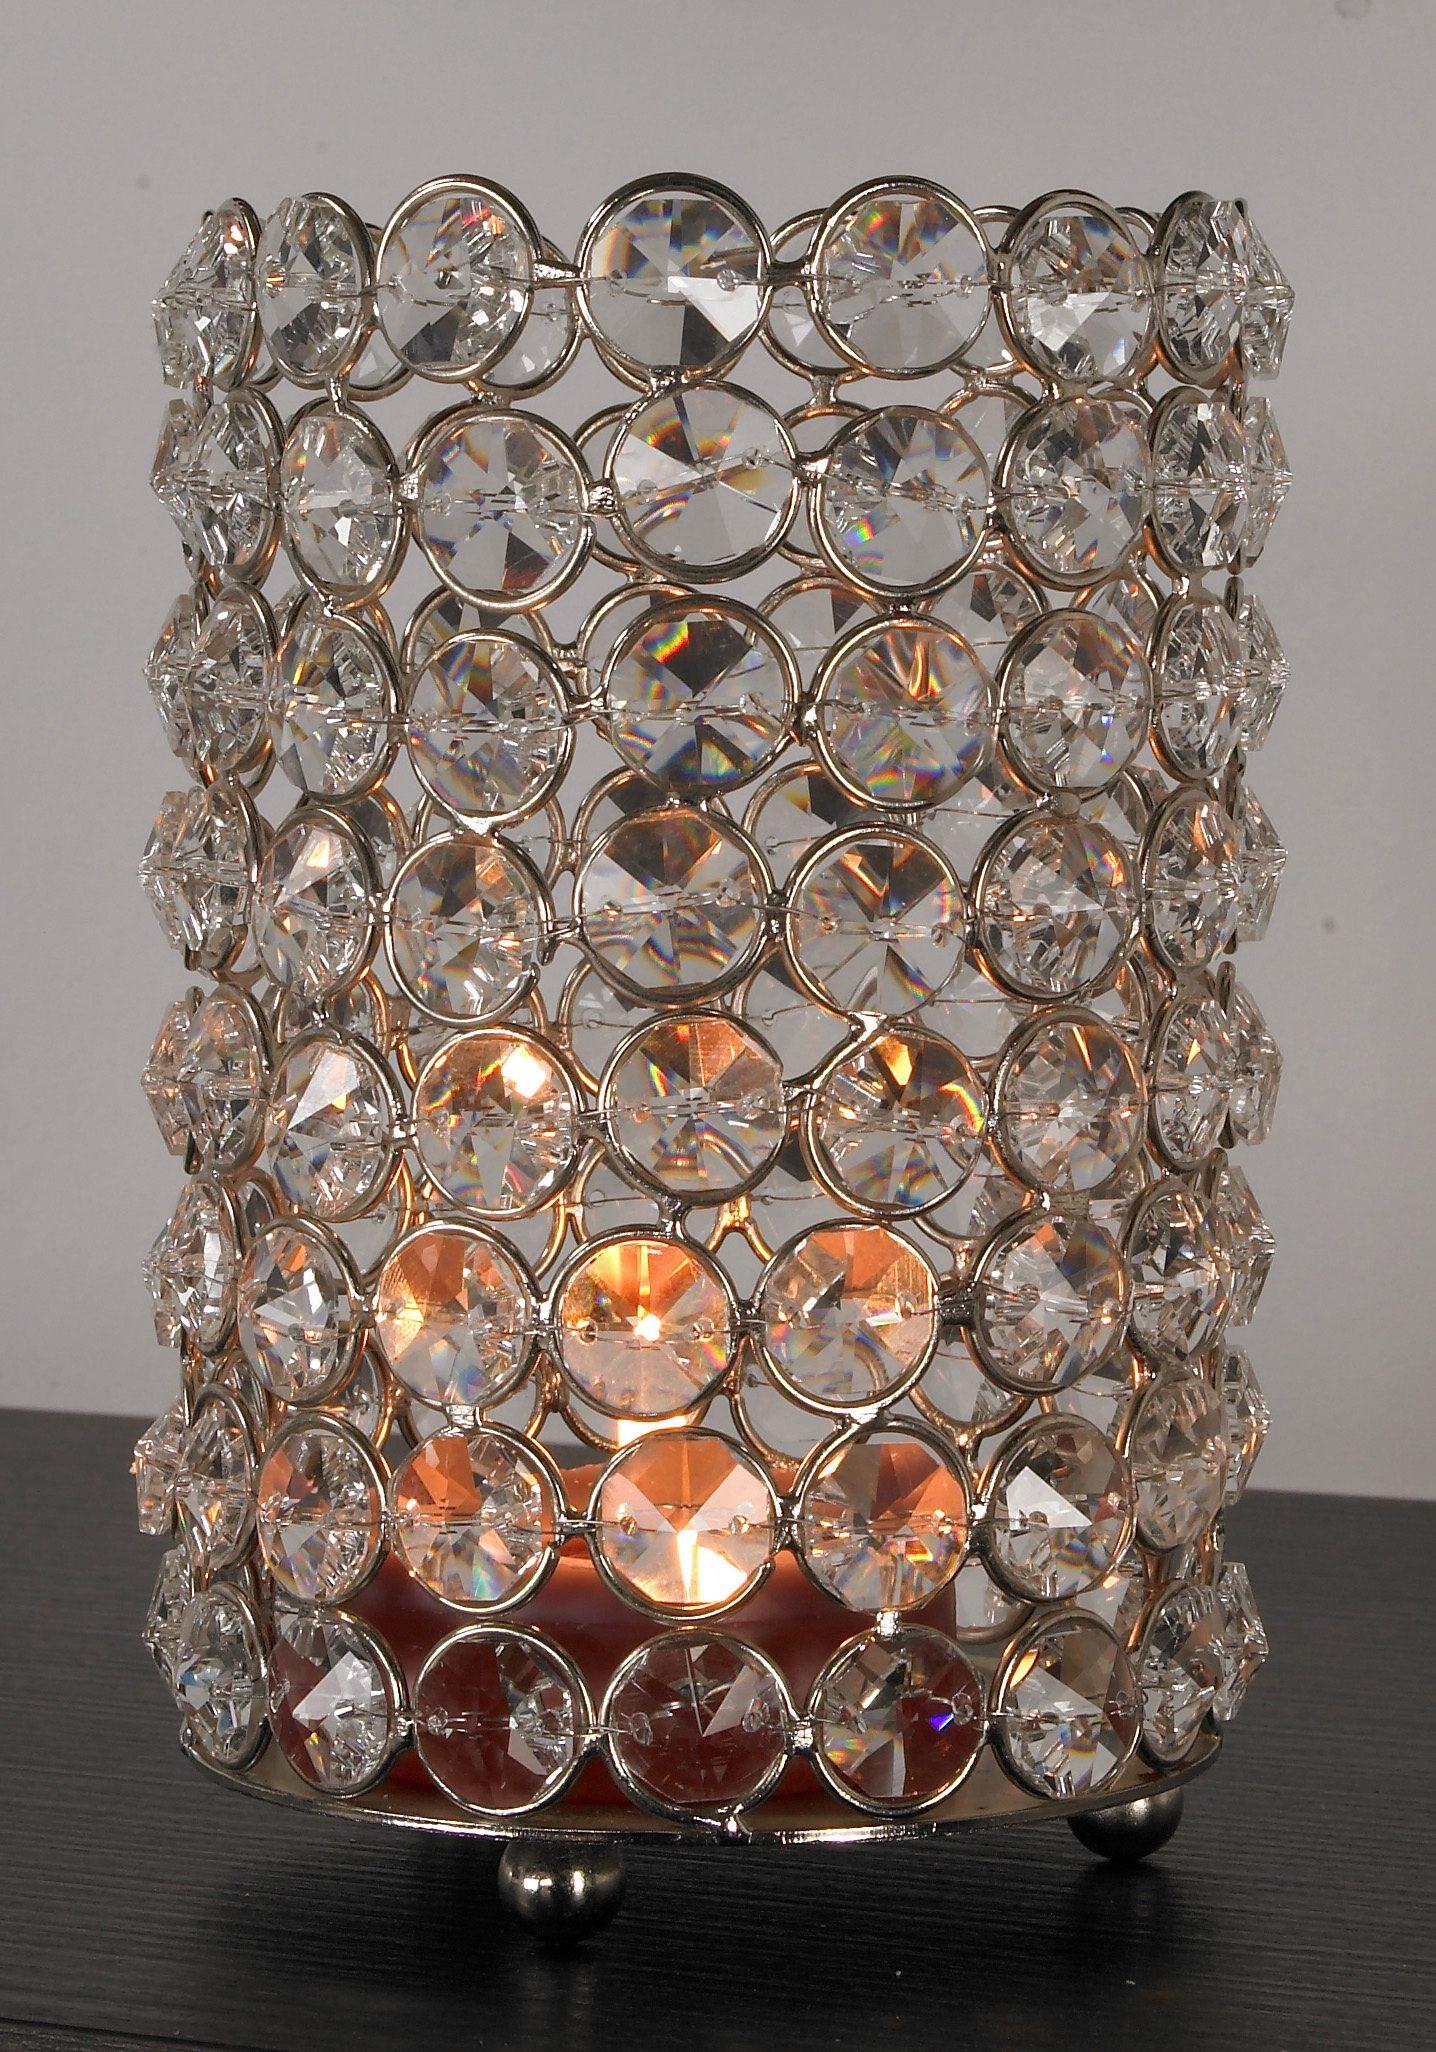 Home affaire Kerzenständer Kristall silberfarben Kerzenhalter Kerzen Laternen Wohnaccessoires